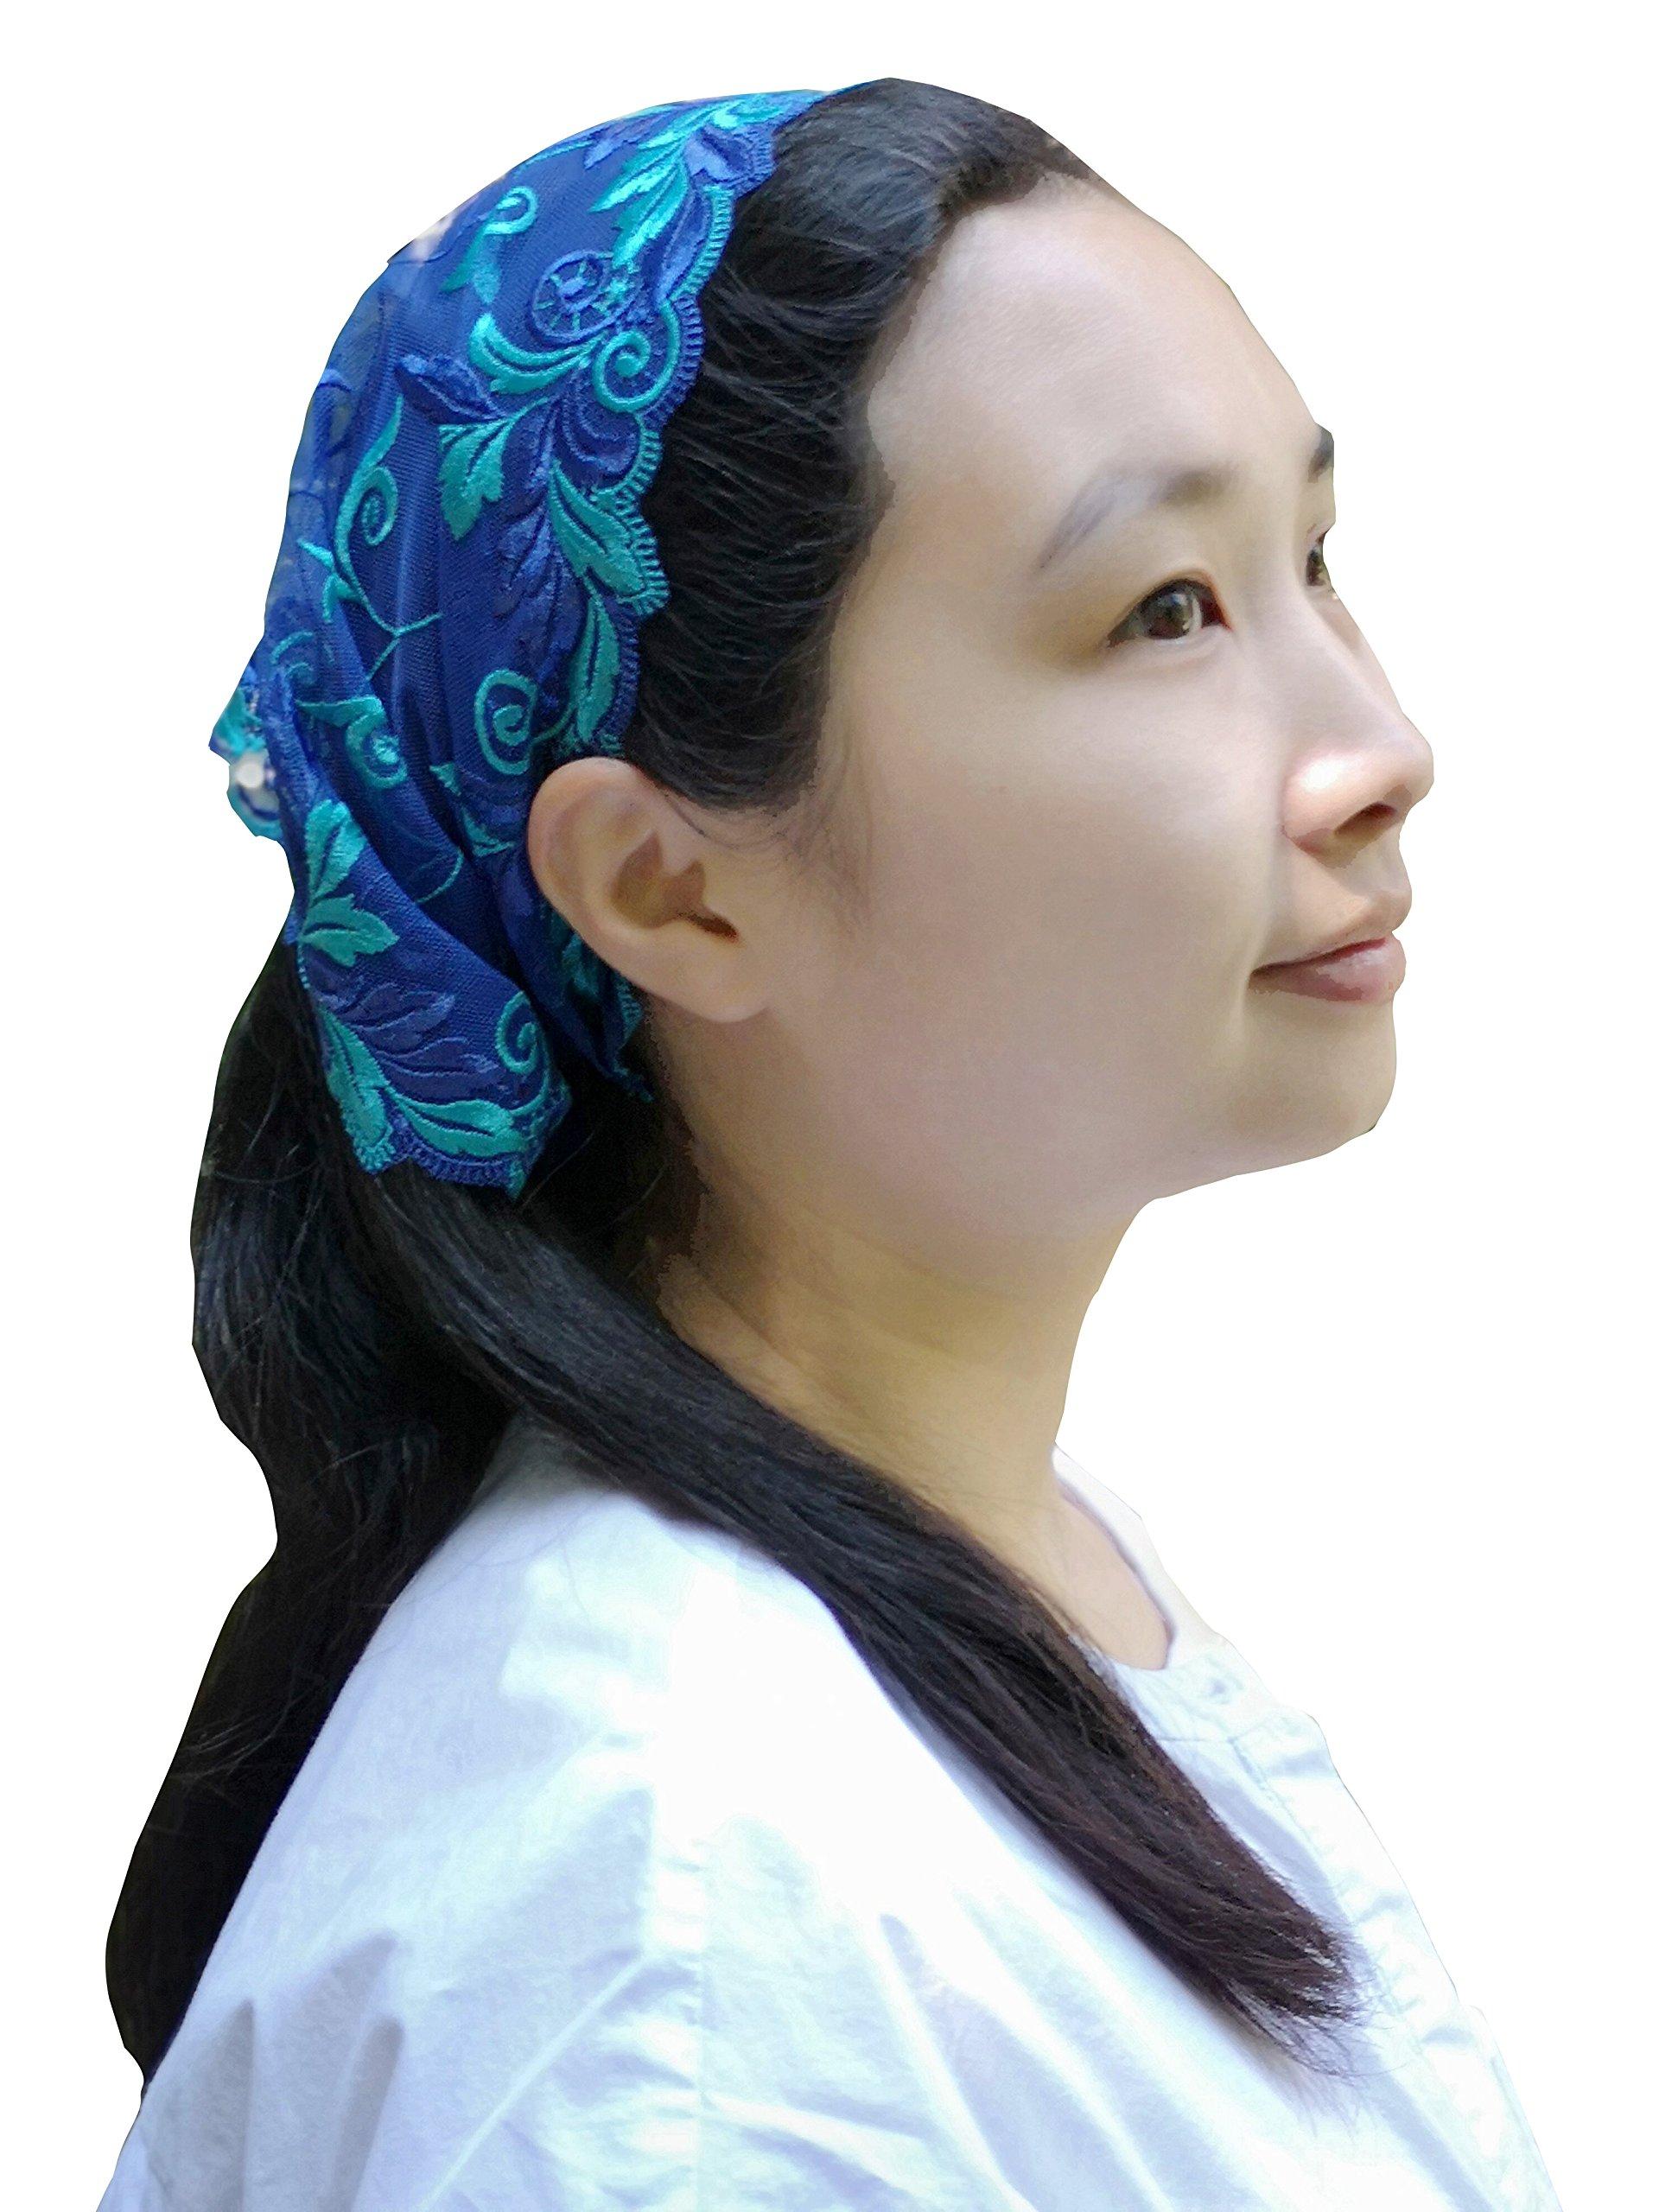 Soft Headwrap Lace Kerchief Tie-style Head Covering Church Veil Y030 (Royal blue)